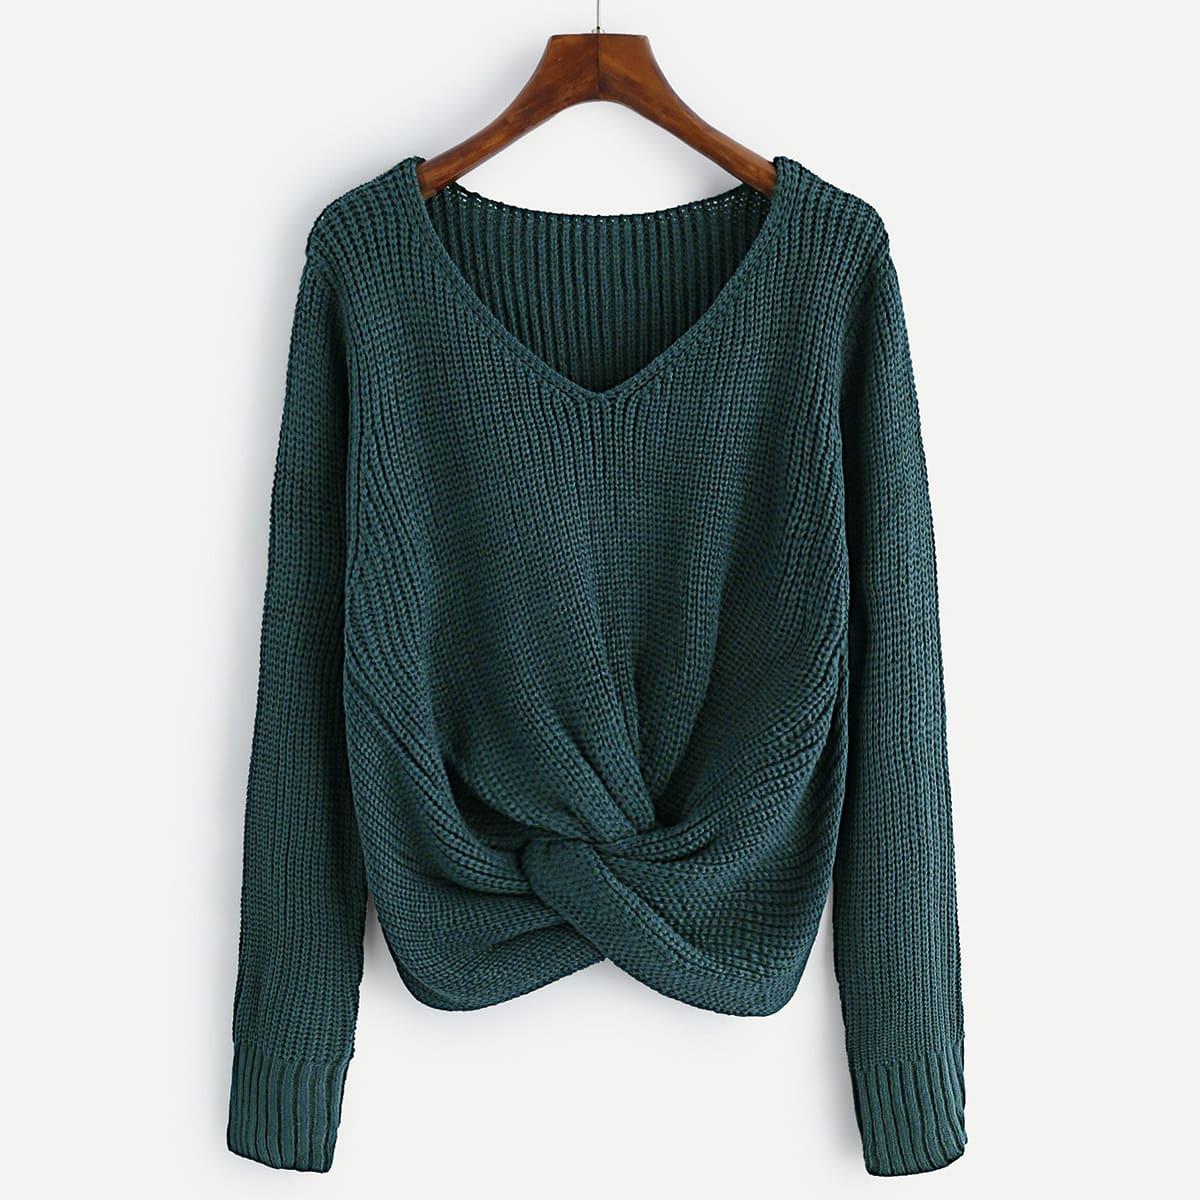 V-hals knit sweater met knoop